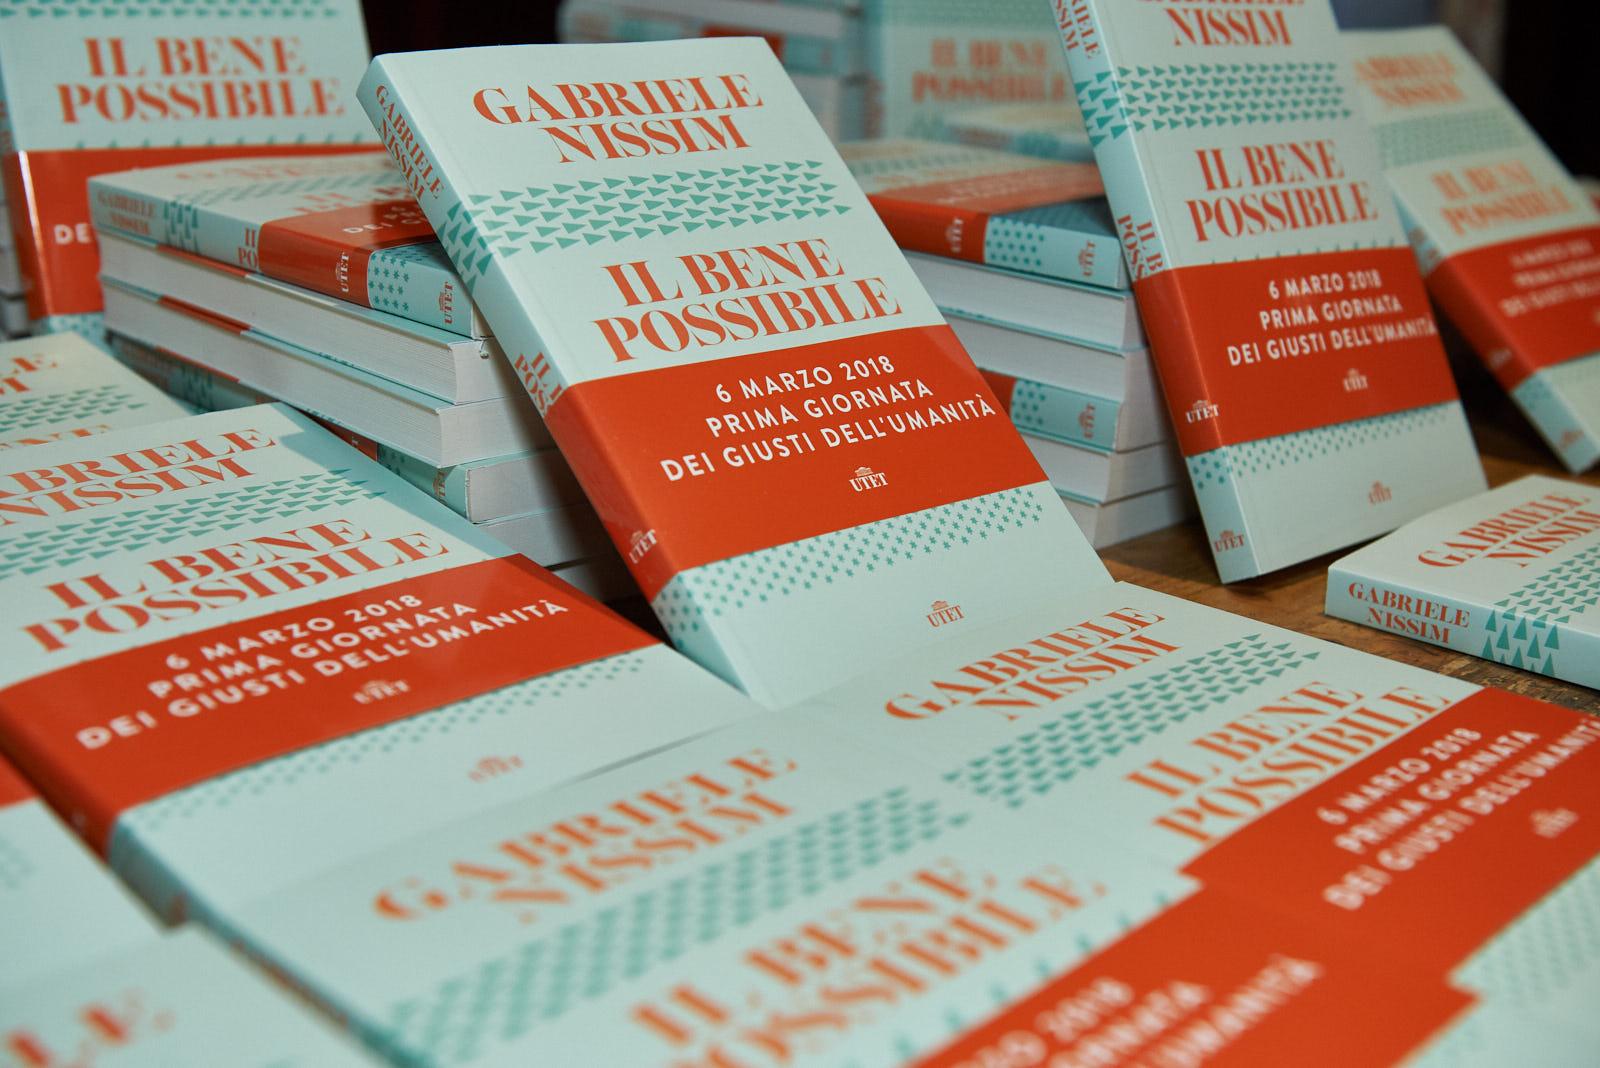 Il bene possibile (Utet) of Gabriele Nissim